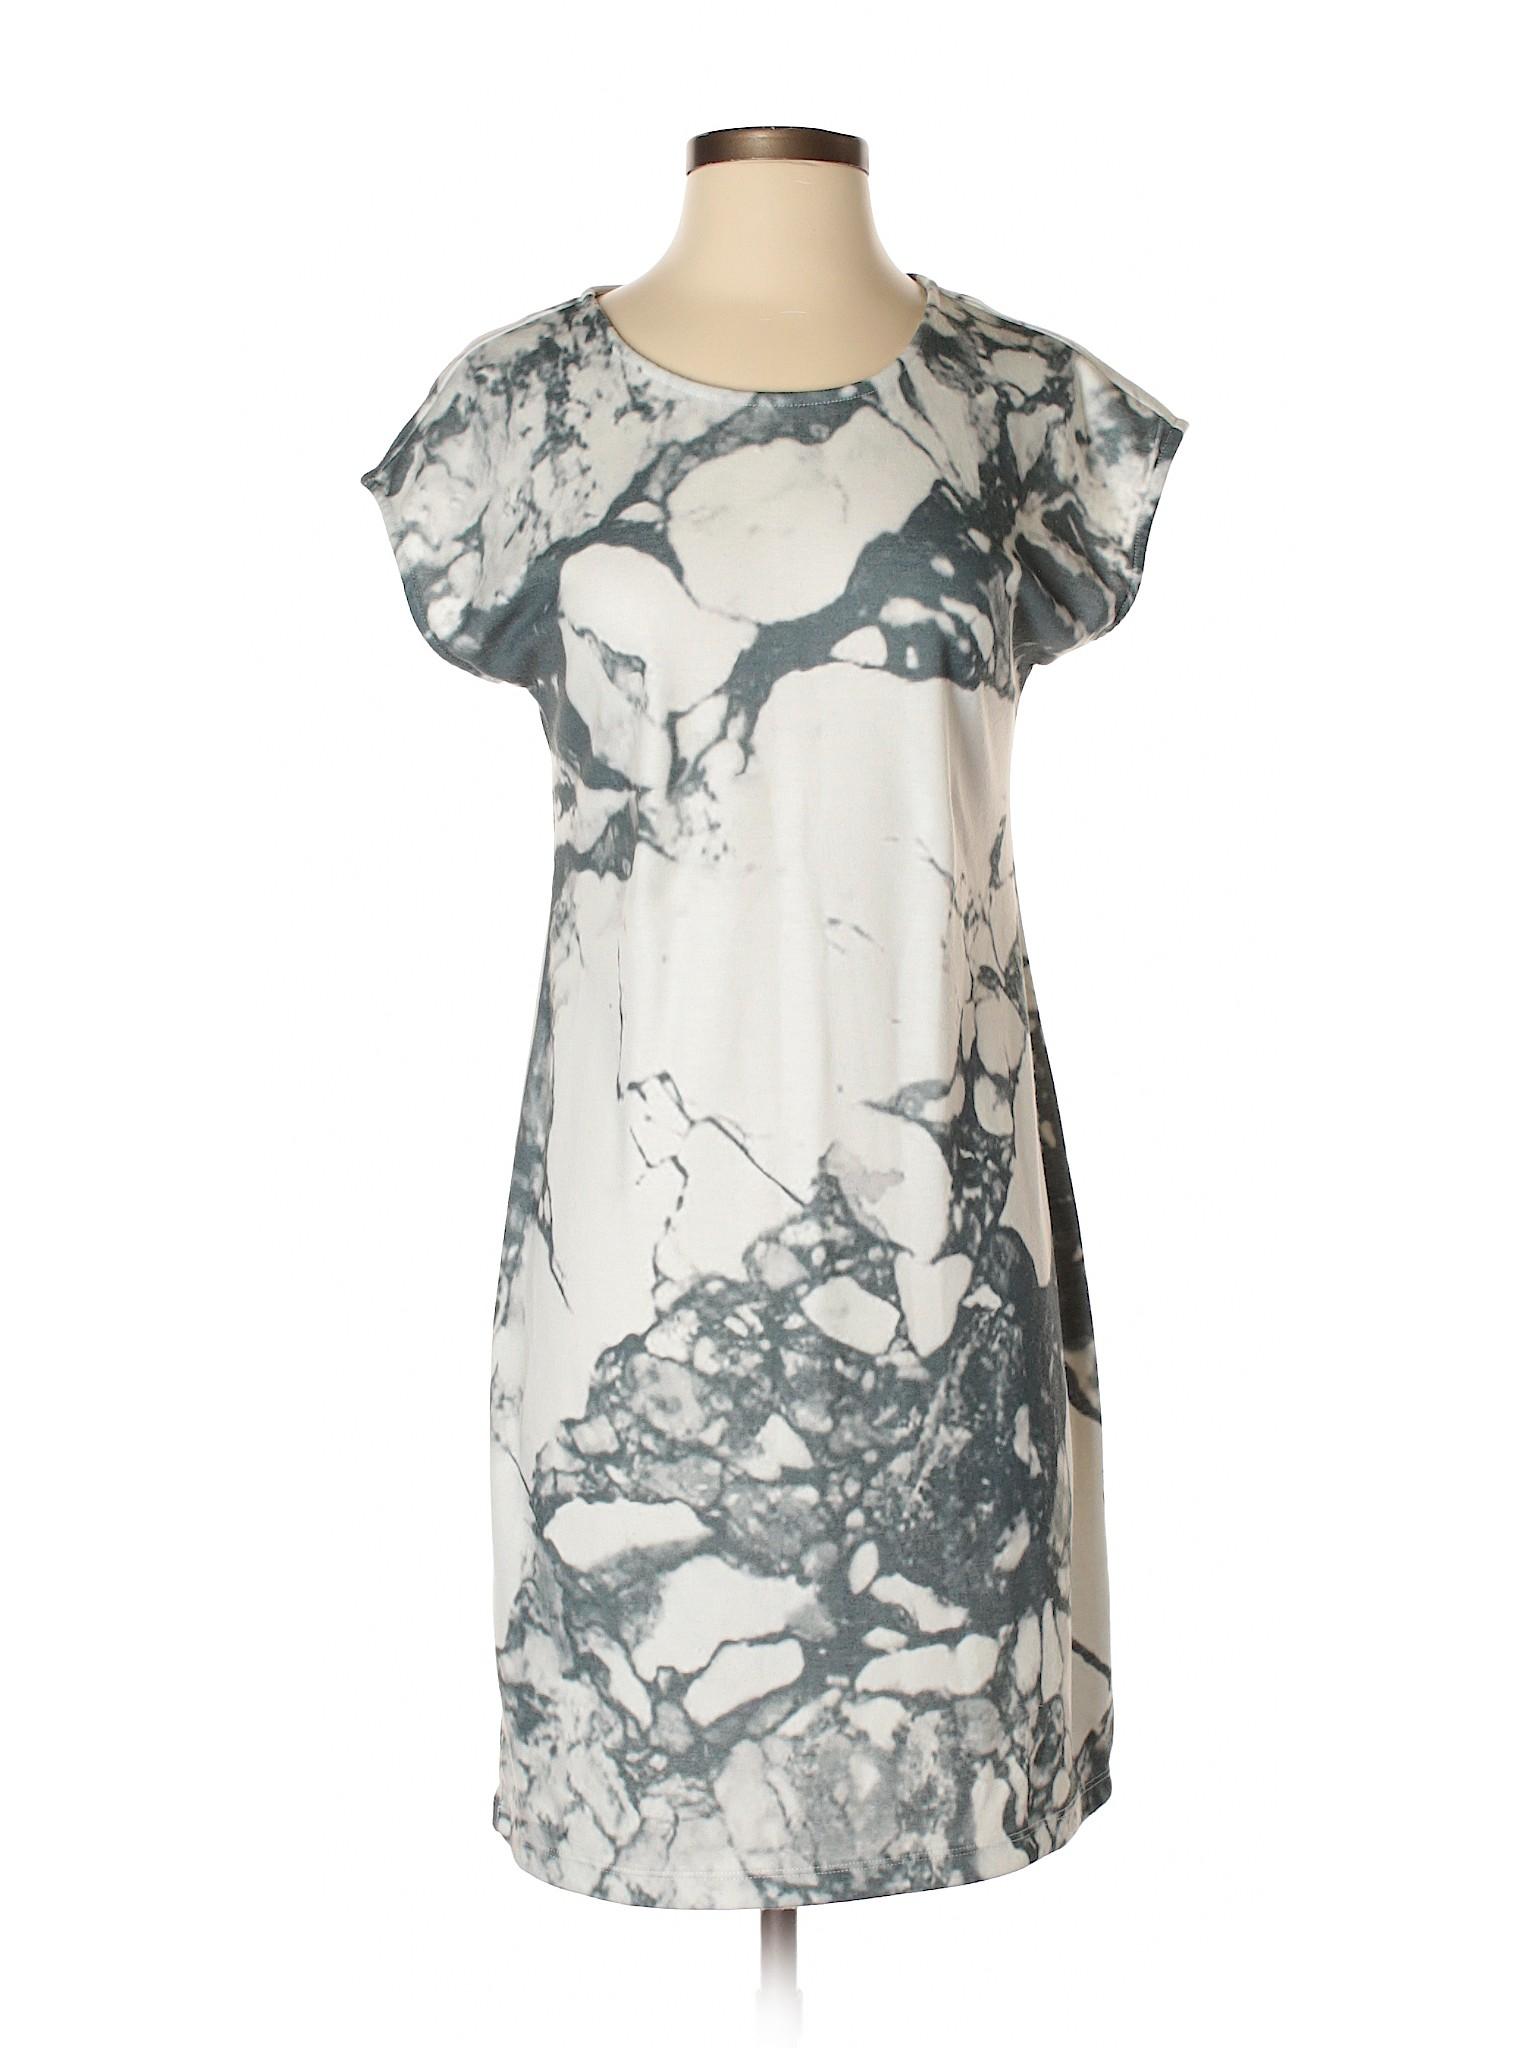 Selling Dress Selling Casual Casual Selling Dress Casual mark mark mark Dress xPv57